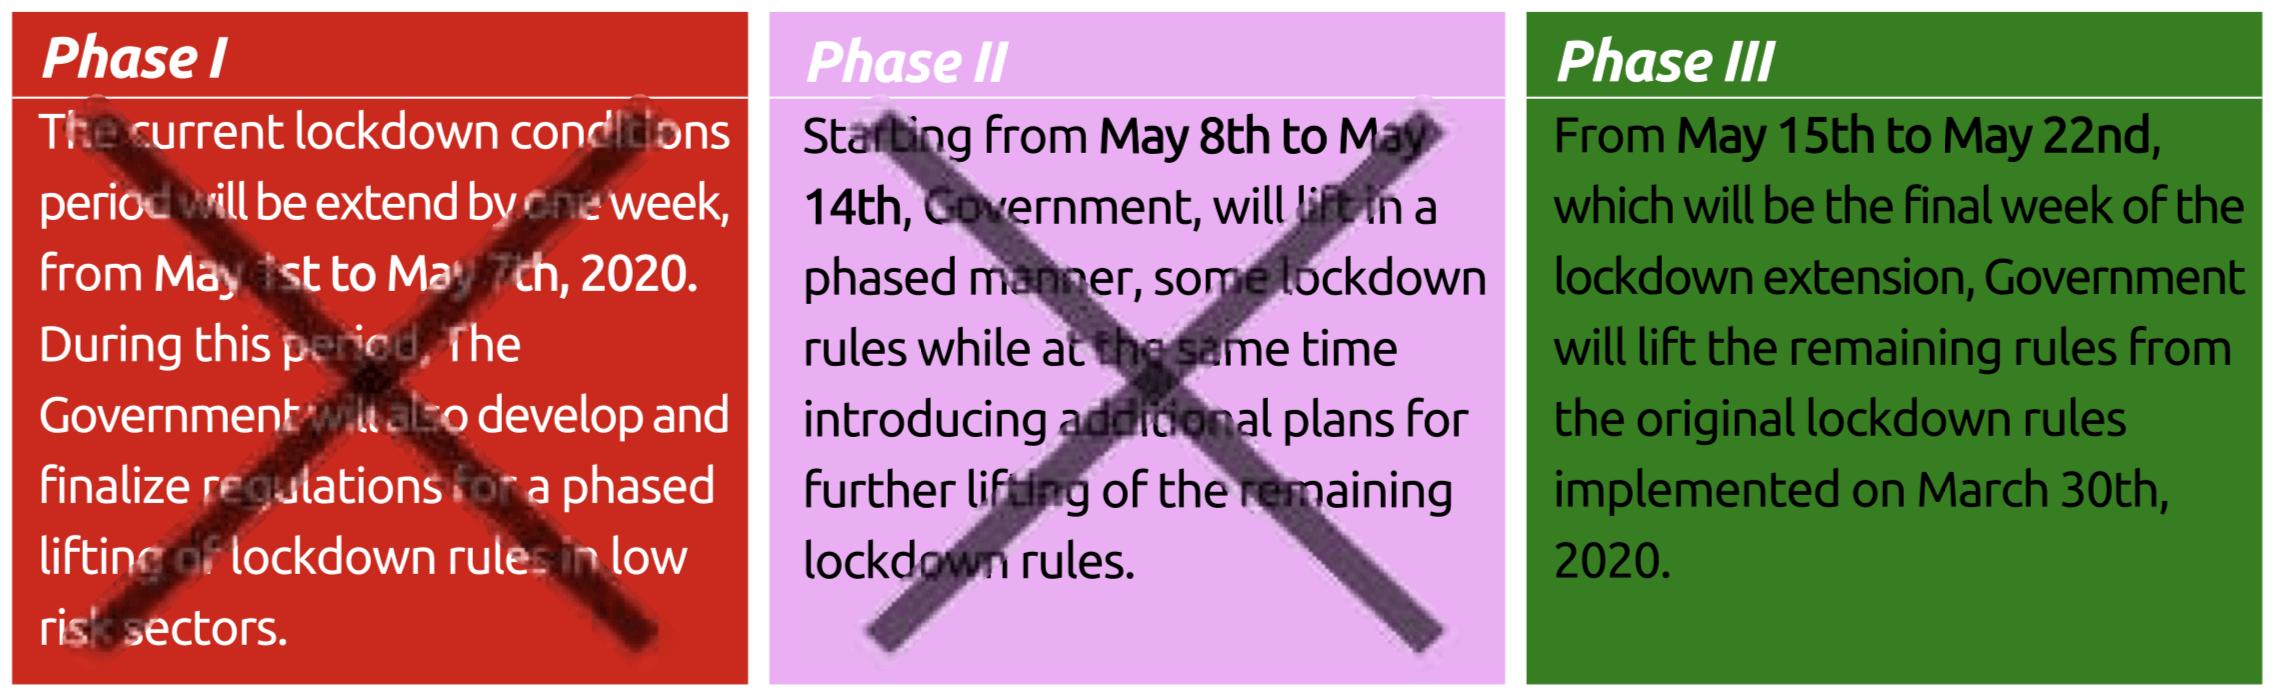 5 fases lockdown Corona Botswana